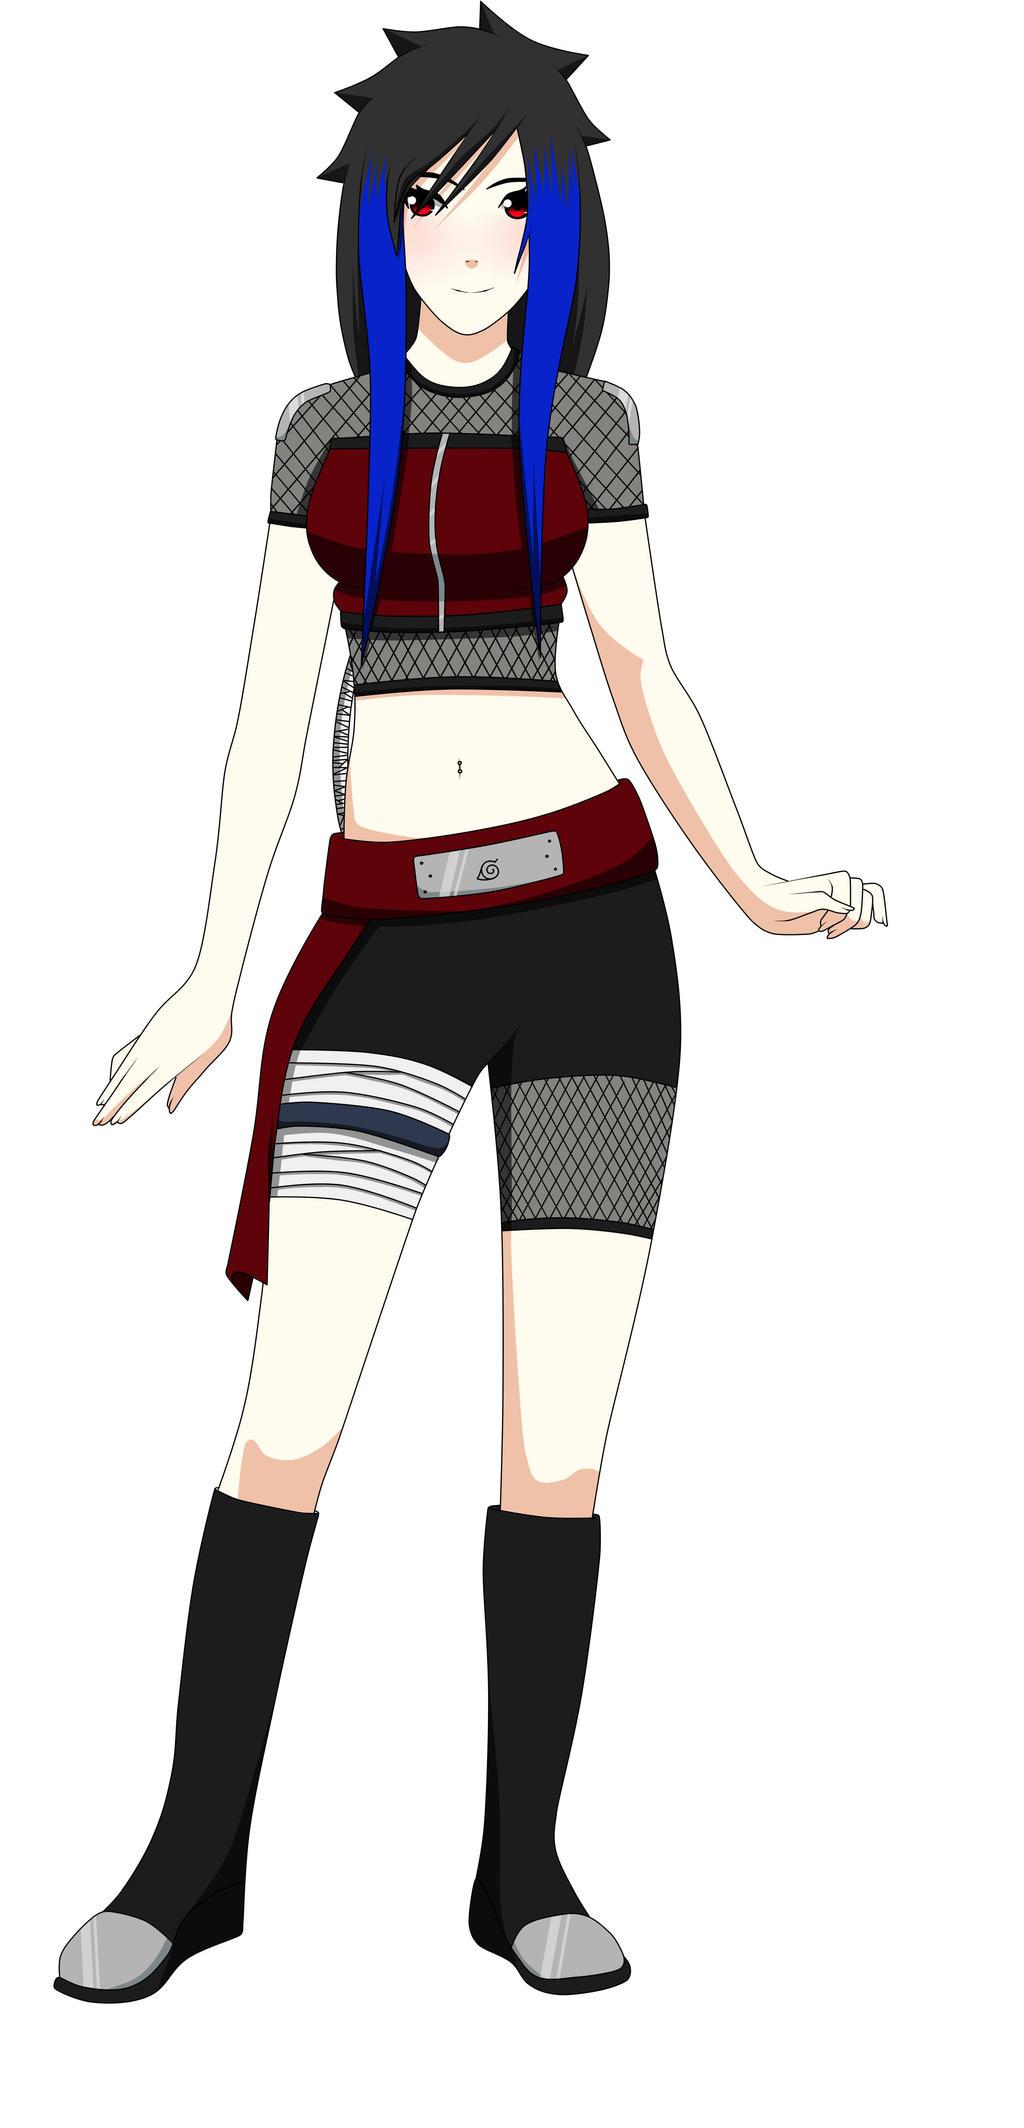 Naruto RPC Lorie Dark Full Body by LorieDark on DeviantArt